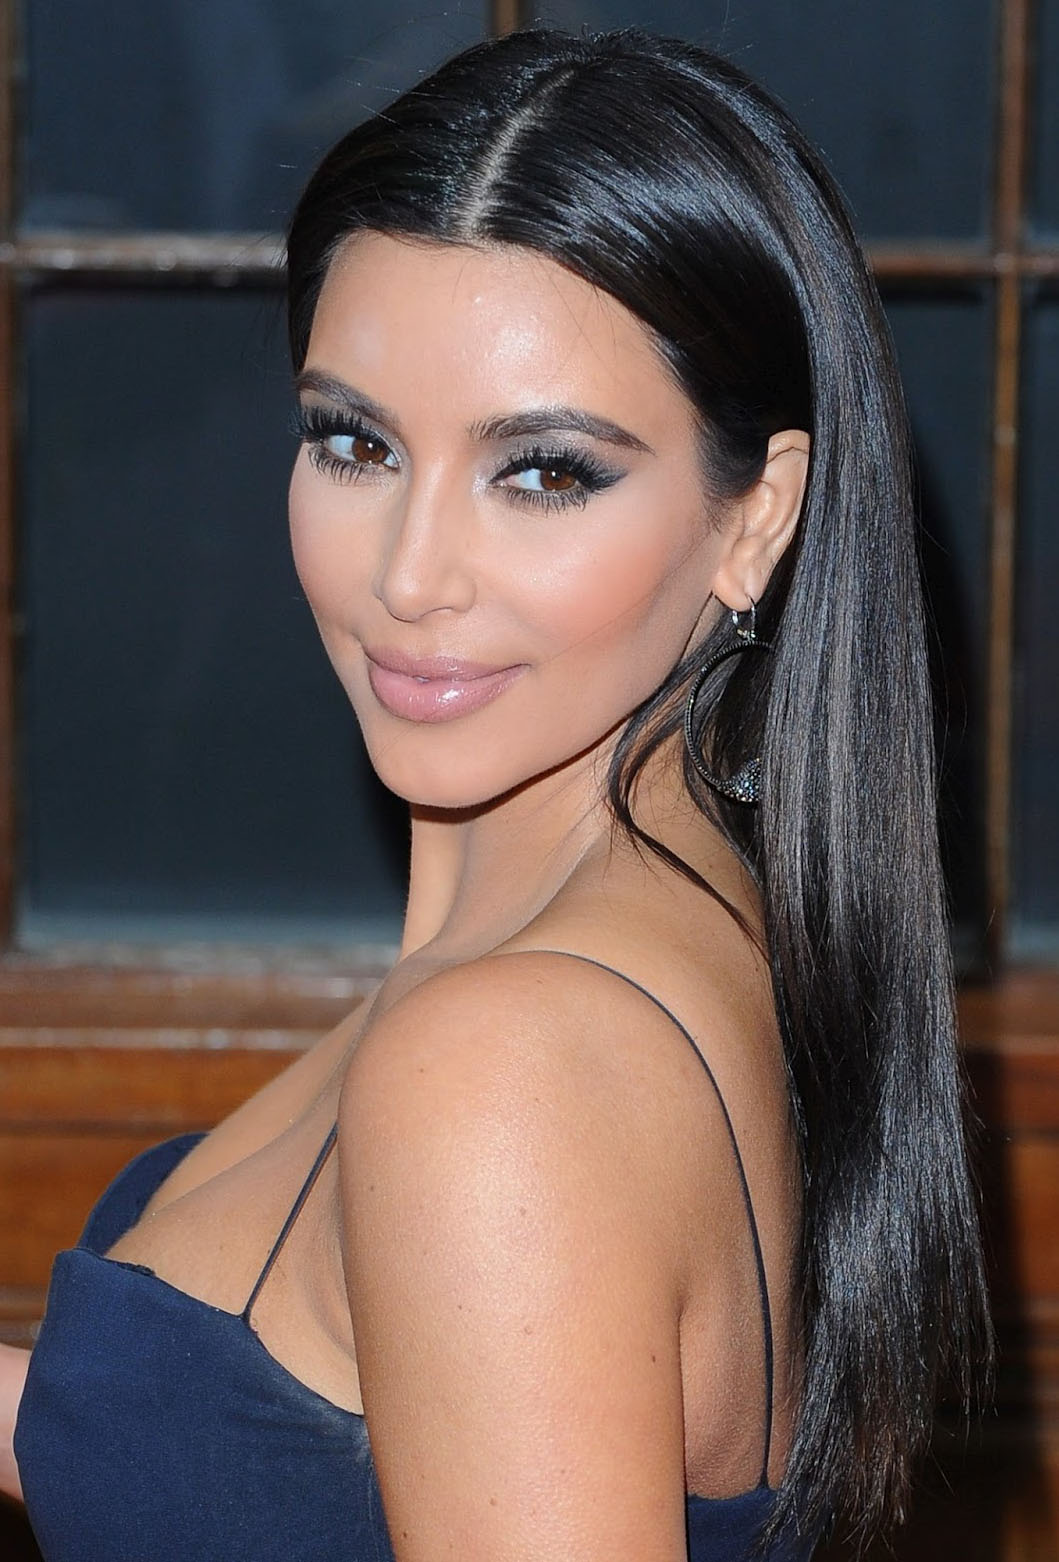 Kim Kardashian Profile And Latest Pictures 2013 1059x1562